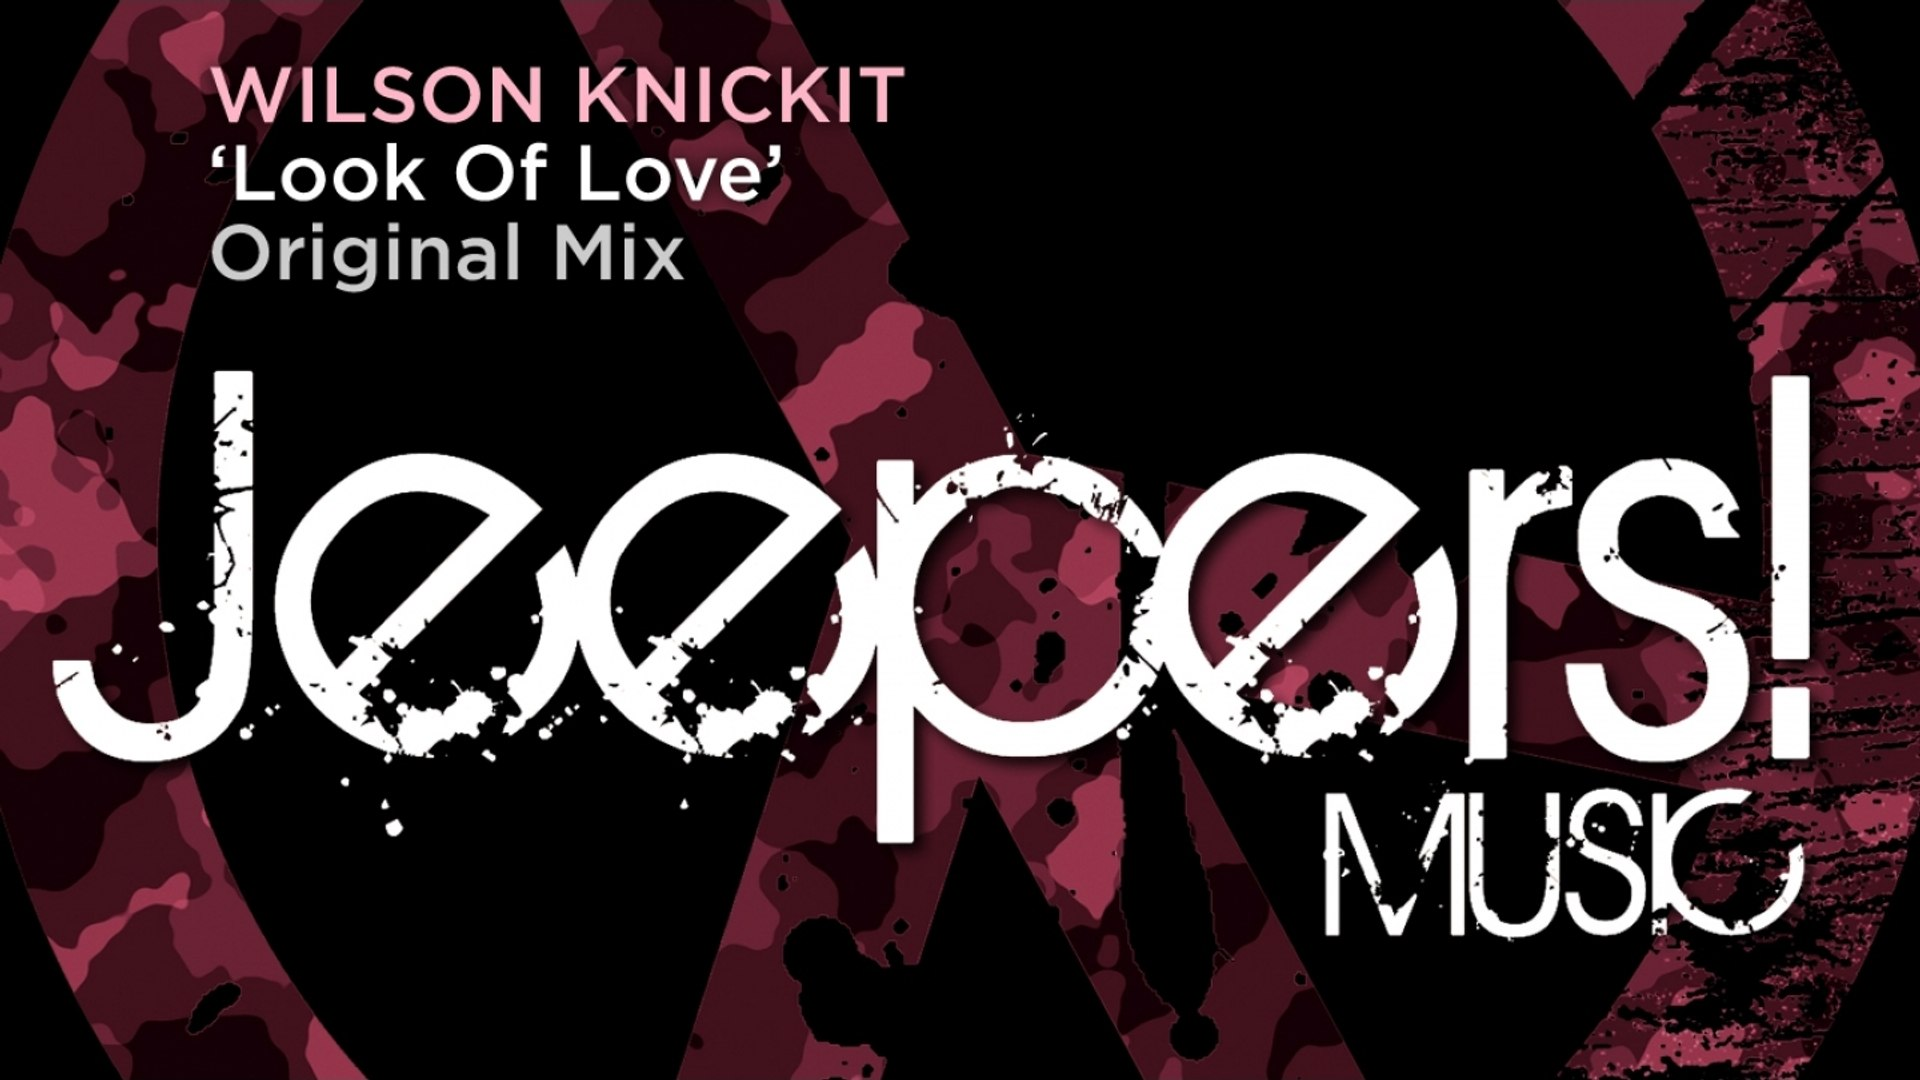 Wilson Knickit - Look Of Love - Original Mix